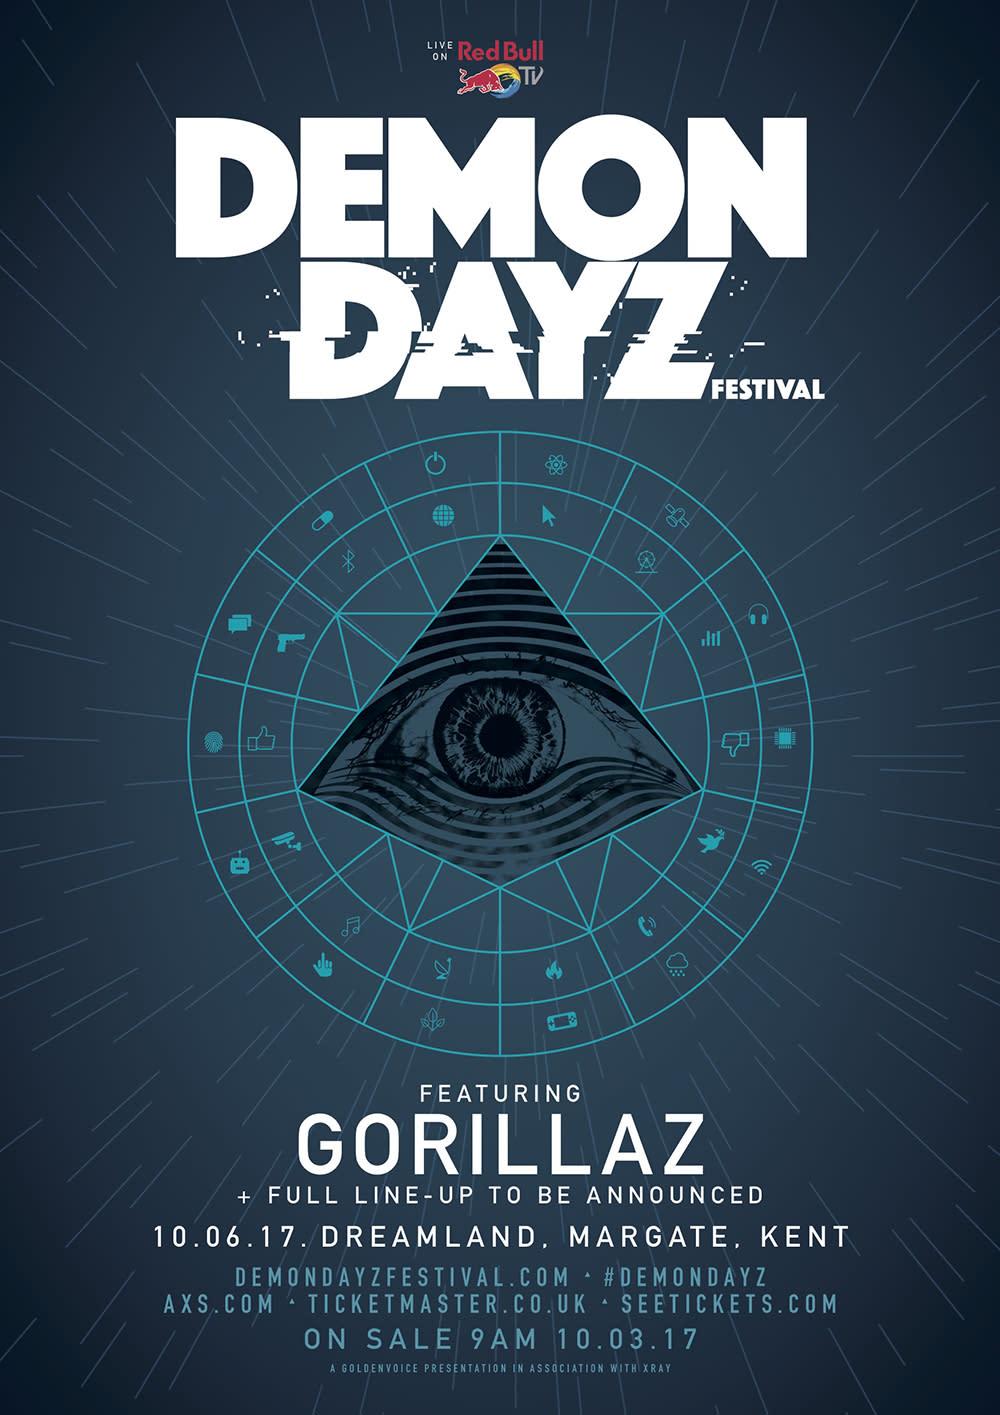 Demon Dayz Festival 2020.Gorillaz Book Restored Theme Park For Demon Dayz Festival